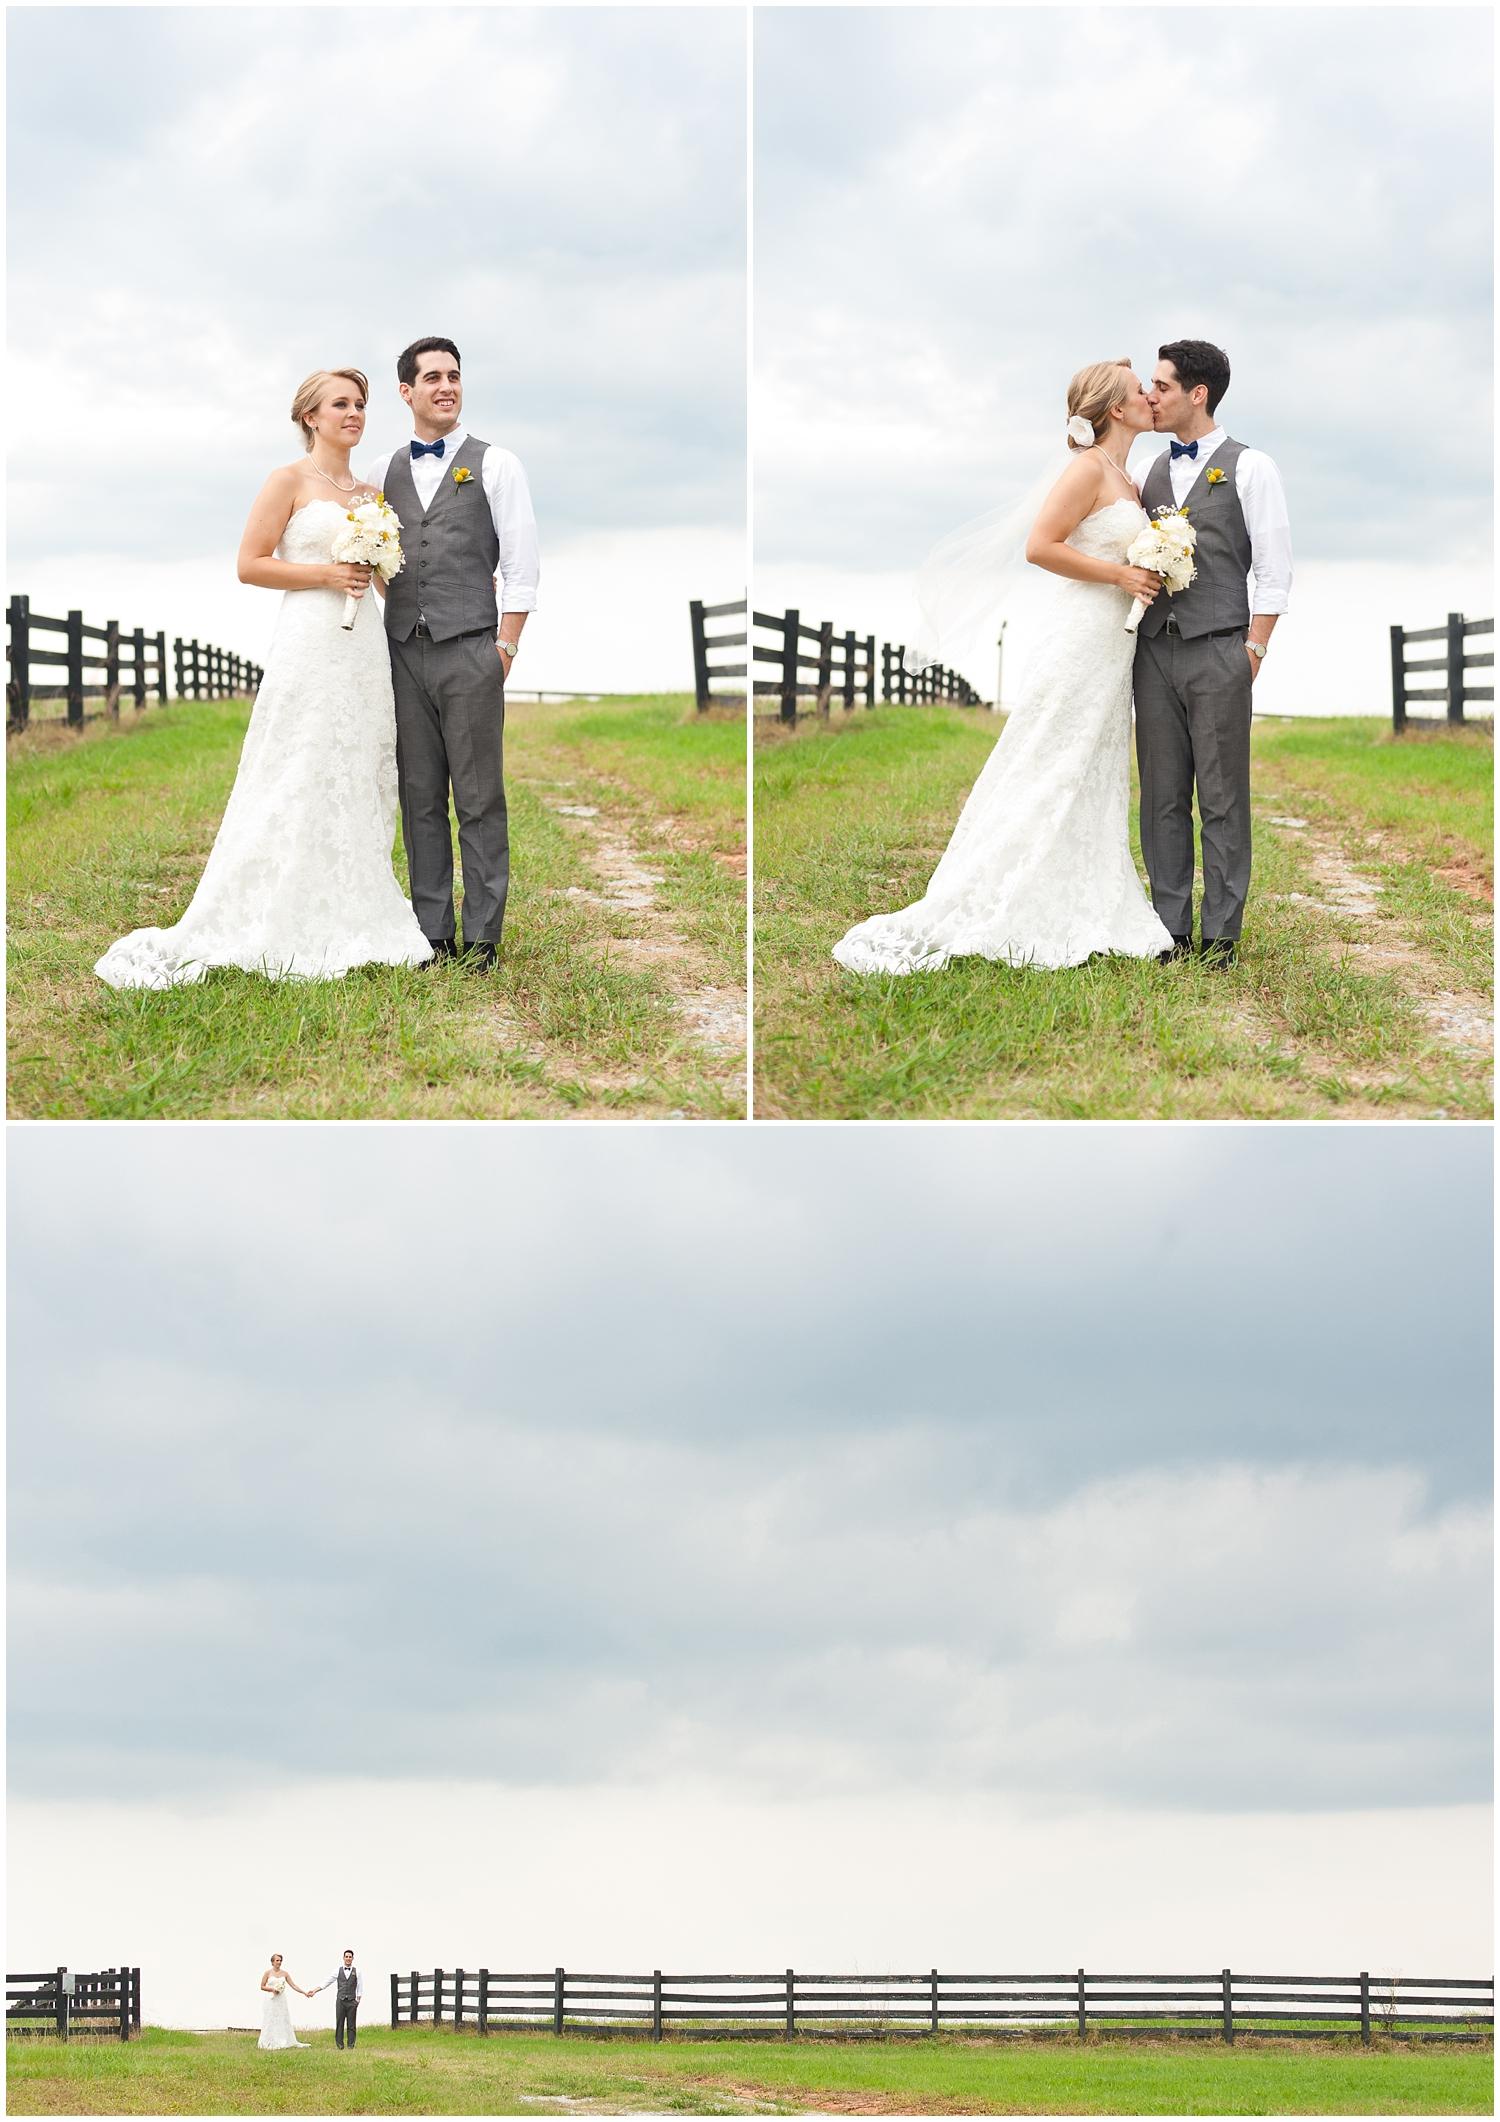 BloomandLo_PeteandAshley_Smithonia_Farm_Wedding_Blog_0023.jpg